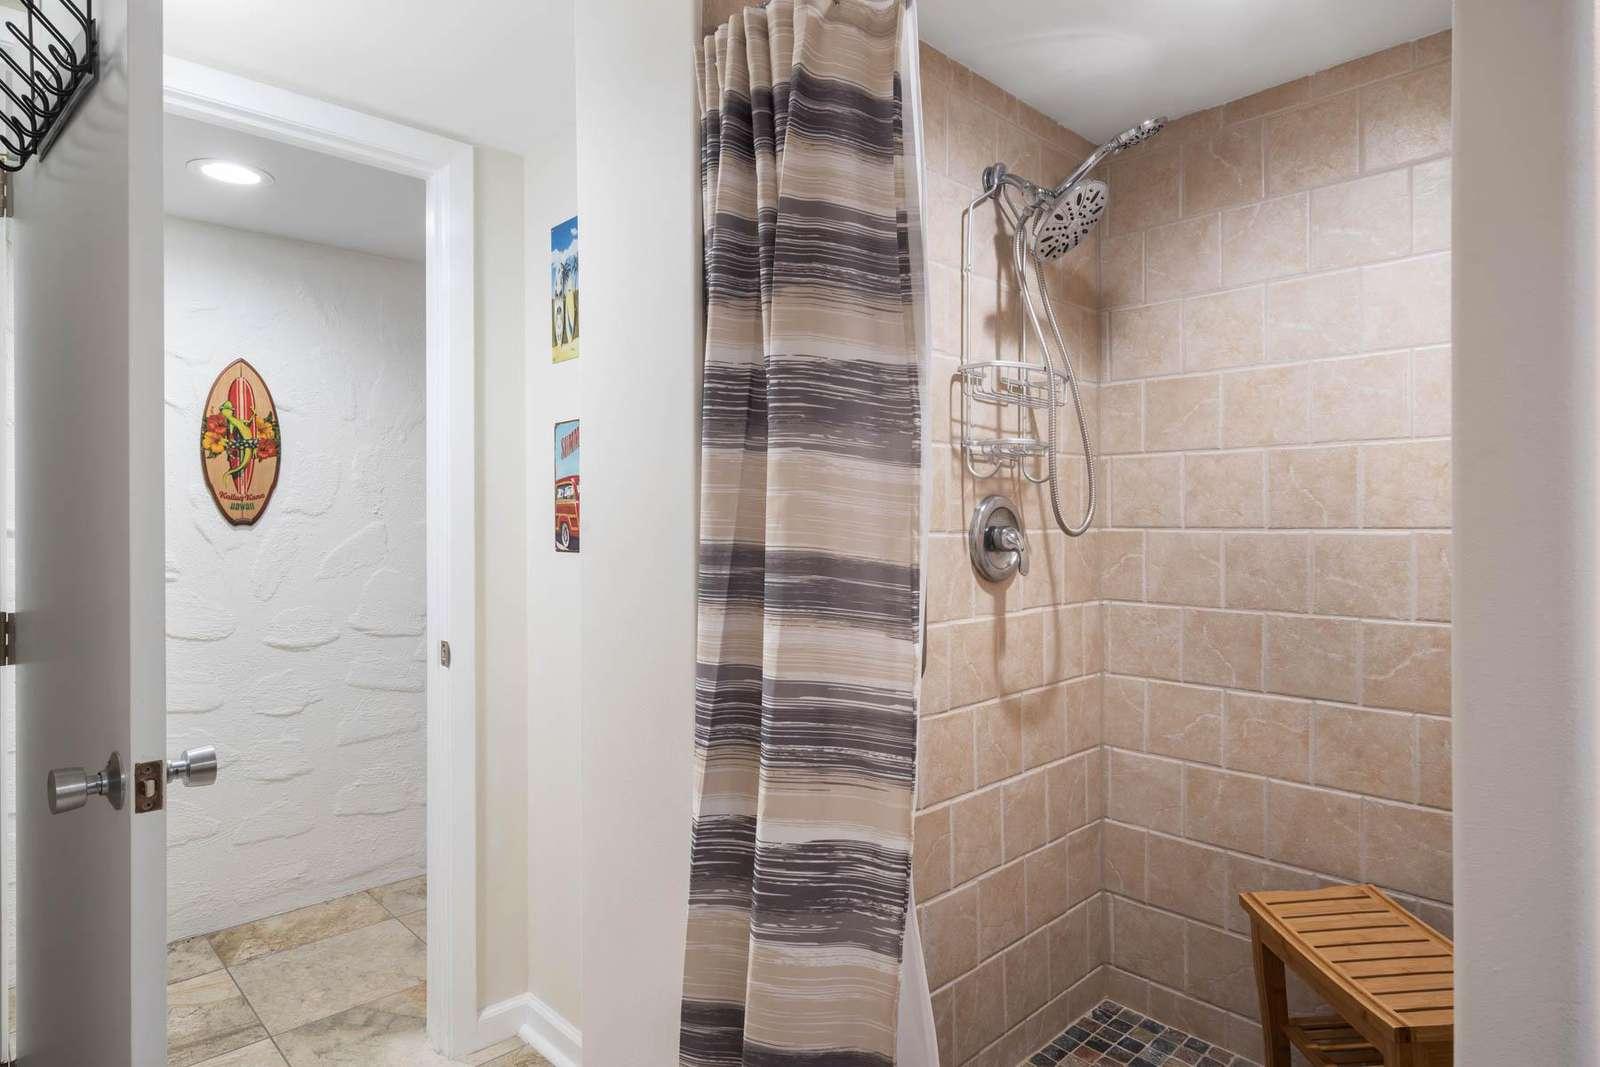 Nice shower in the bathroom